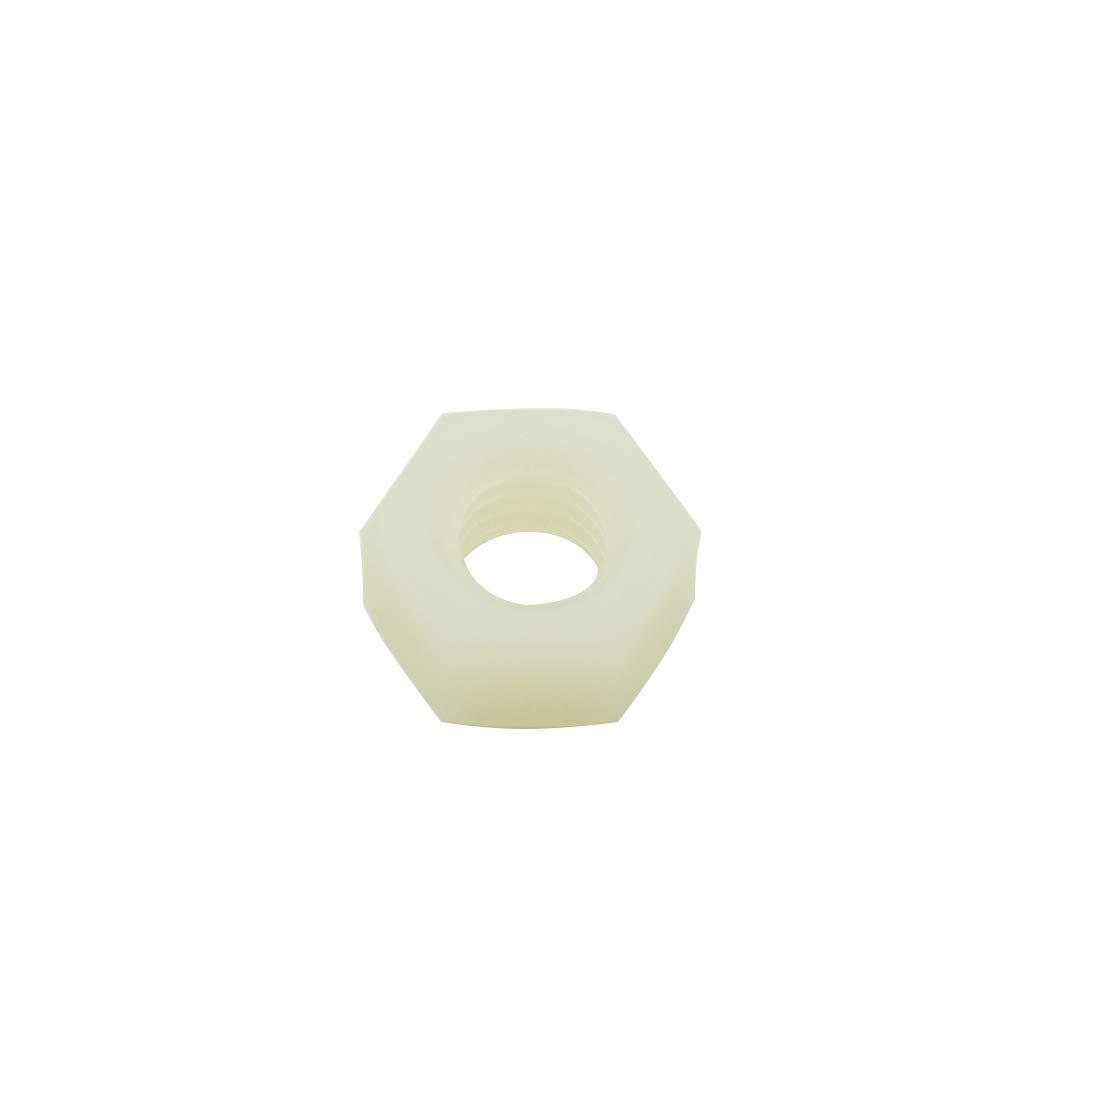 100 Pcs Hxchen M6 Nylon Hex Nut Metric Thread Plastic Hexagon Nuts White